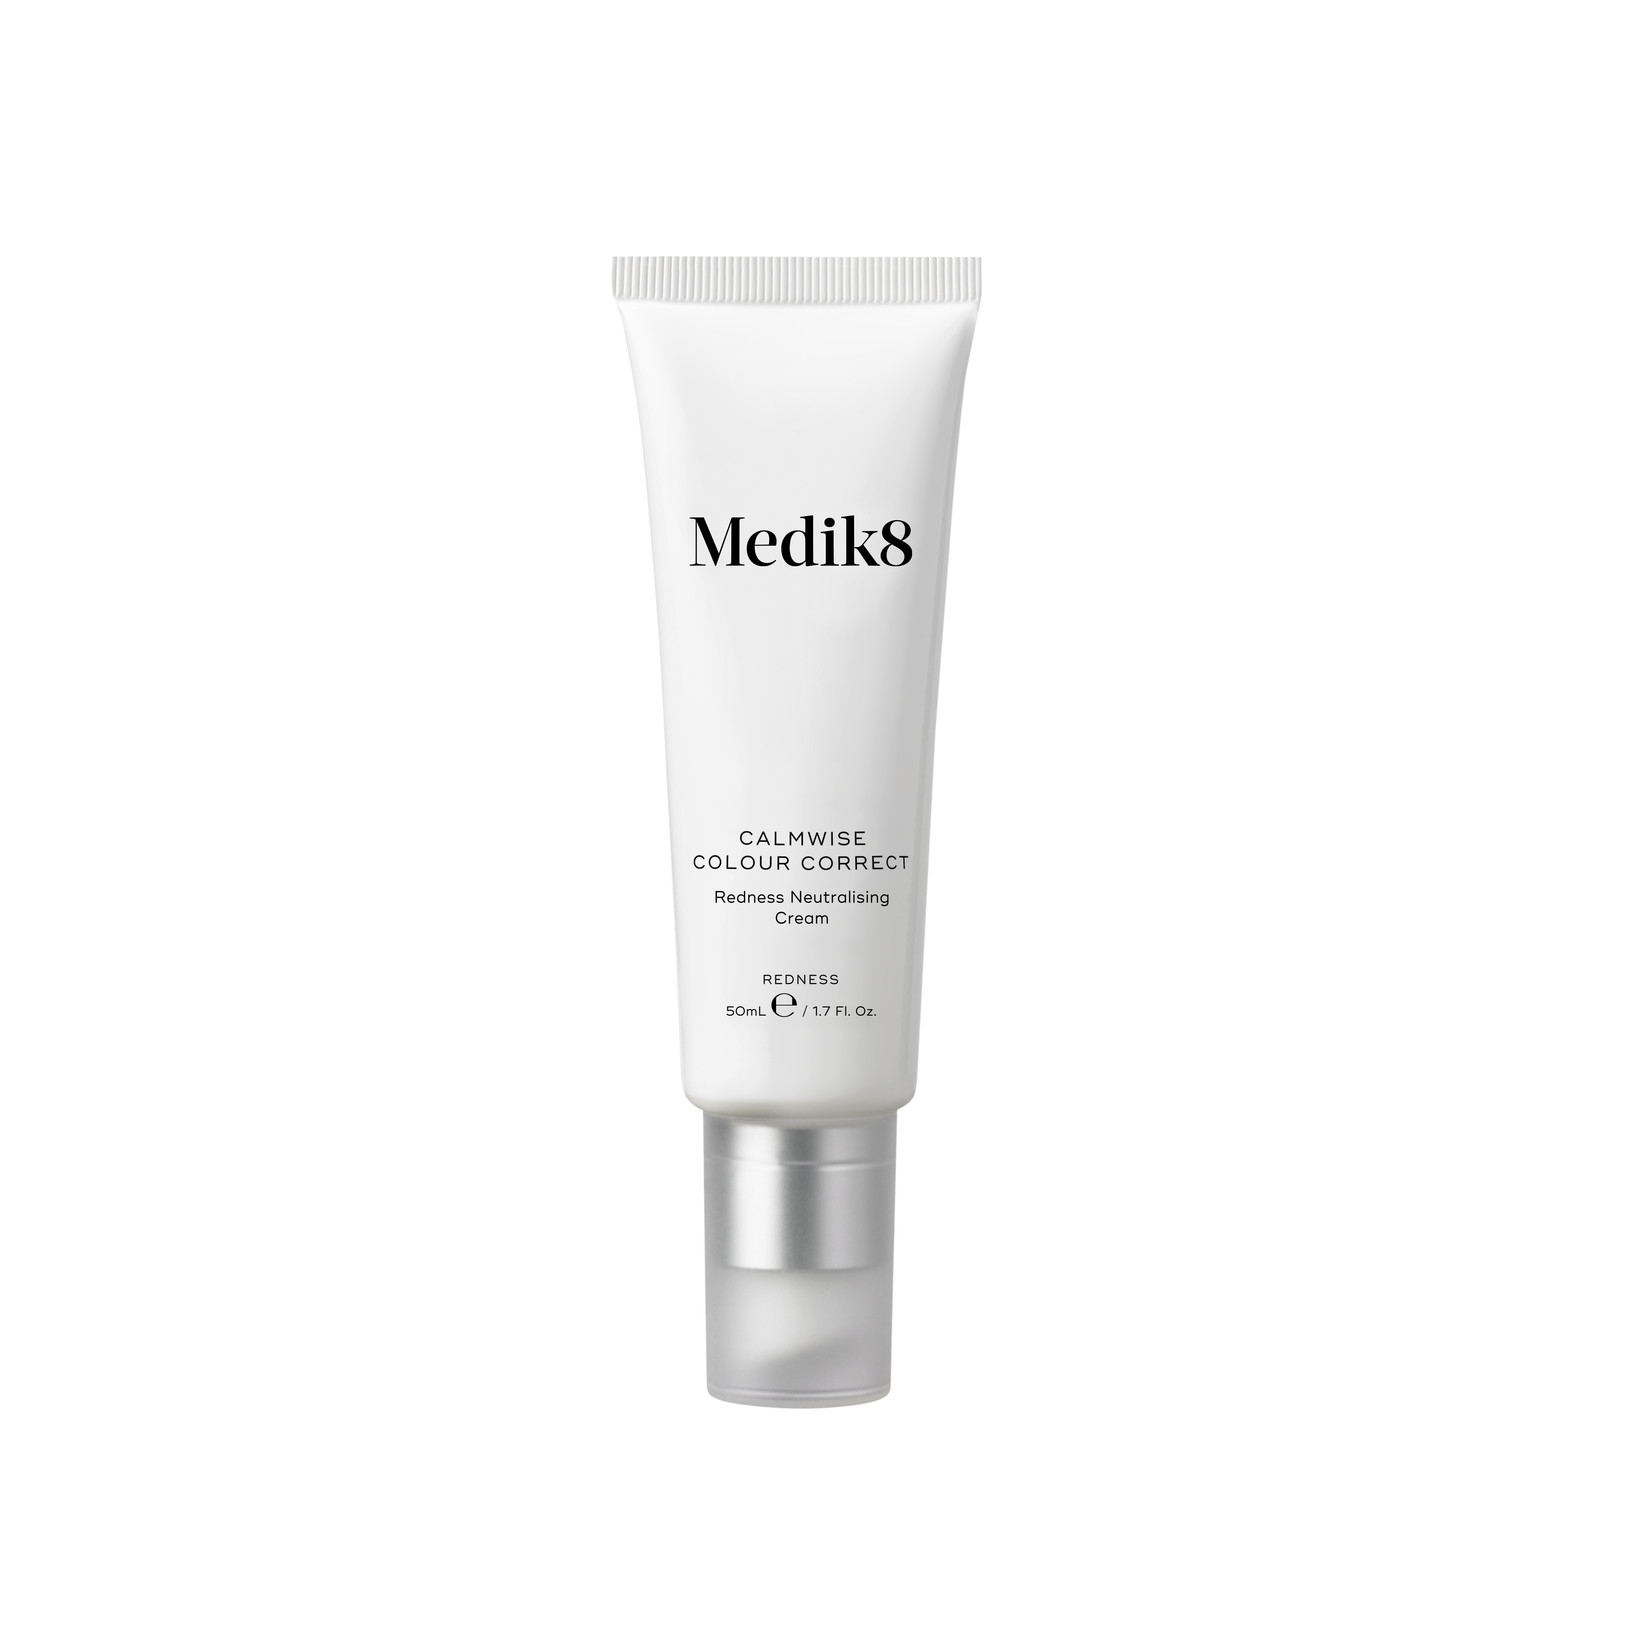 Medik8 Medik8 Try me Size: Calmwise Colour Correct (15 ml)